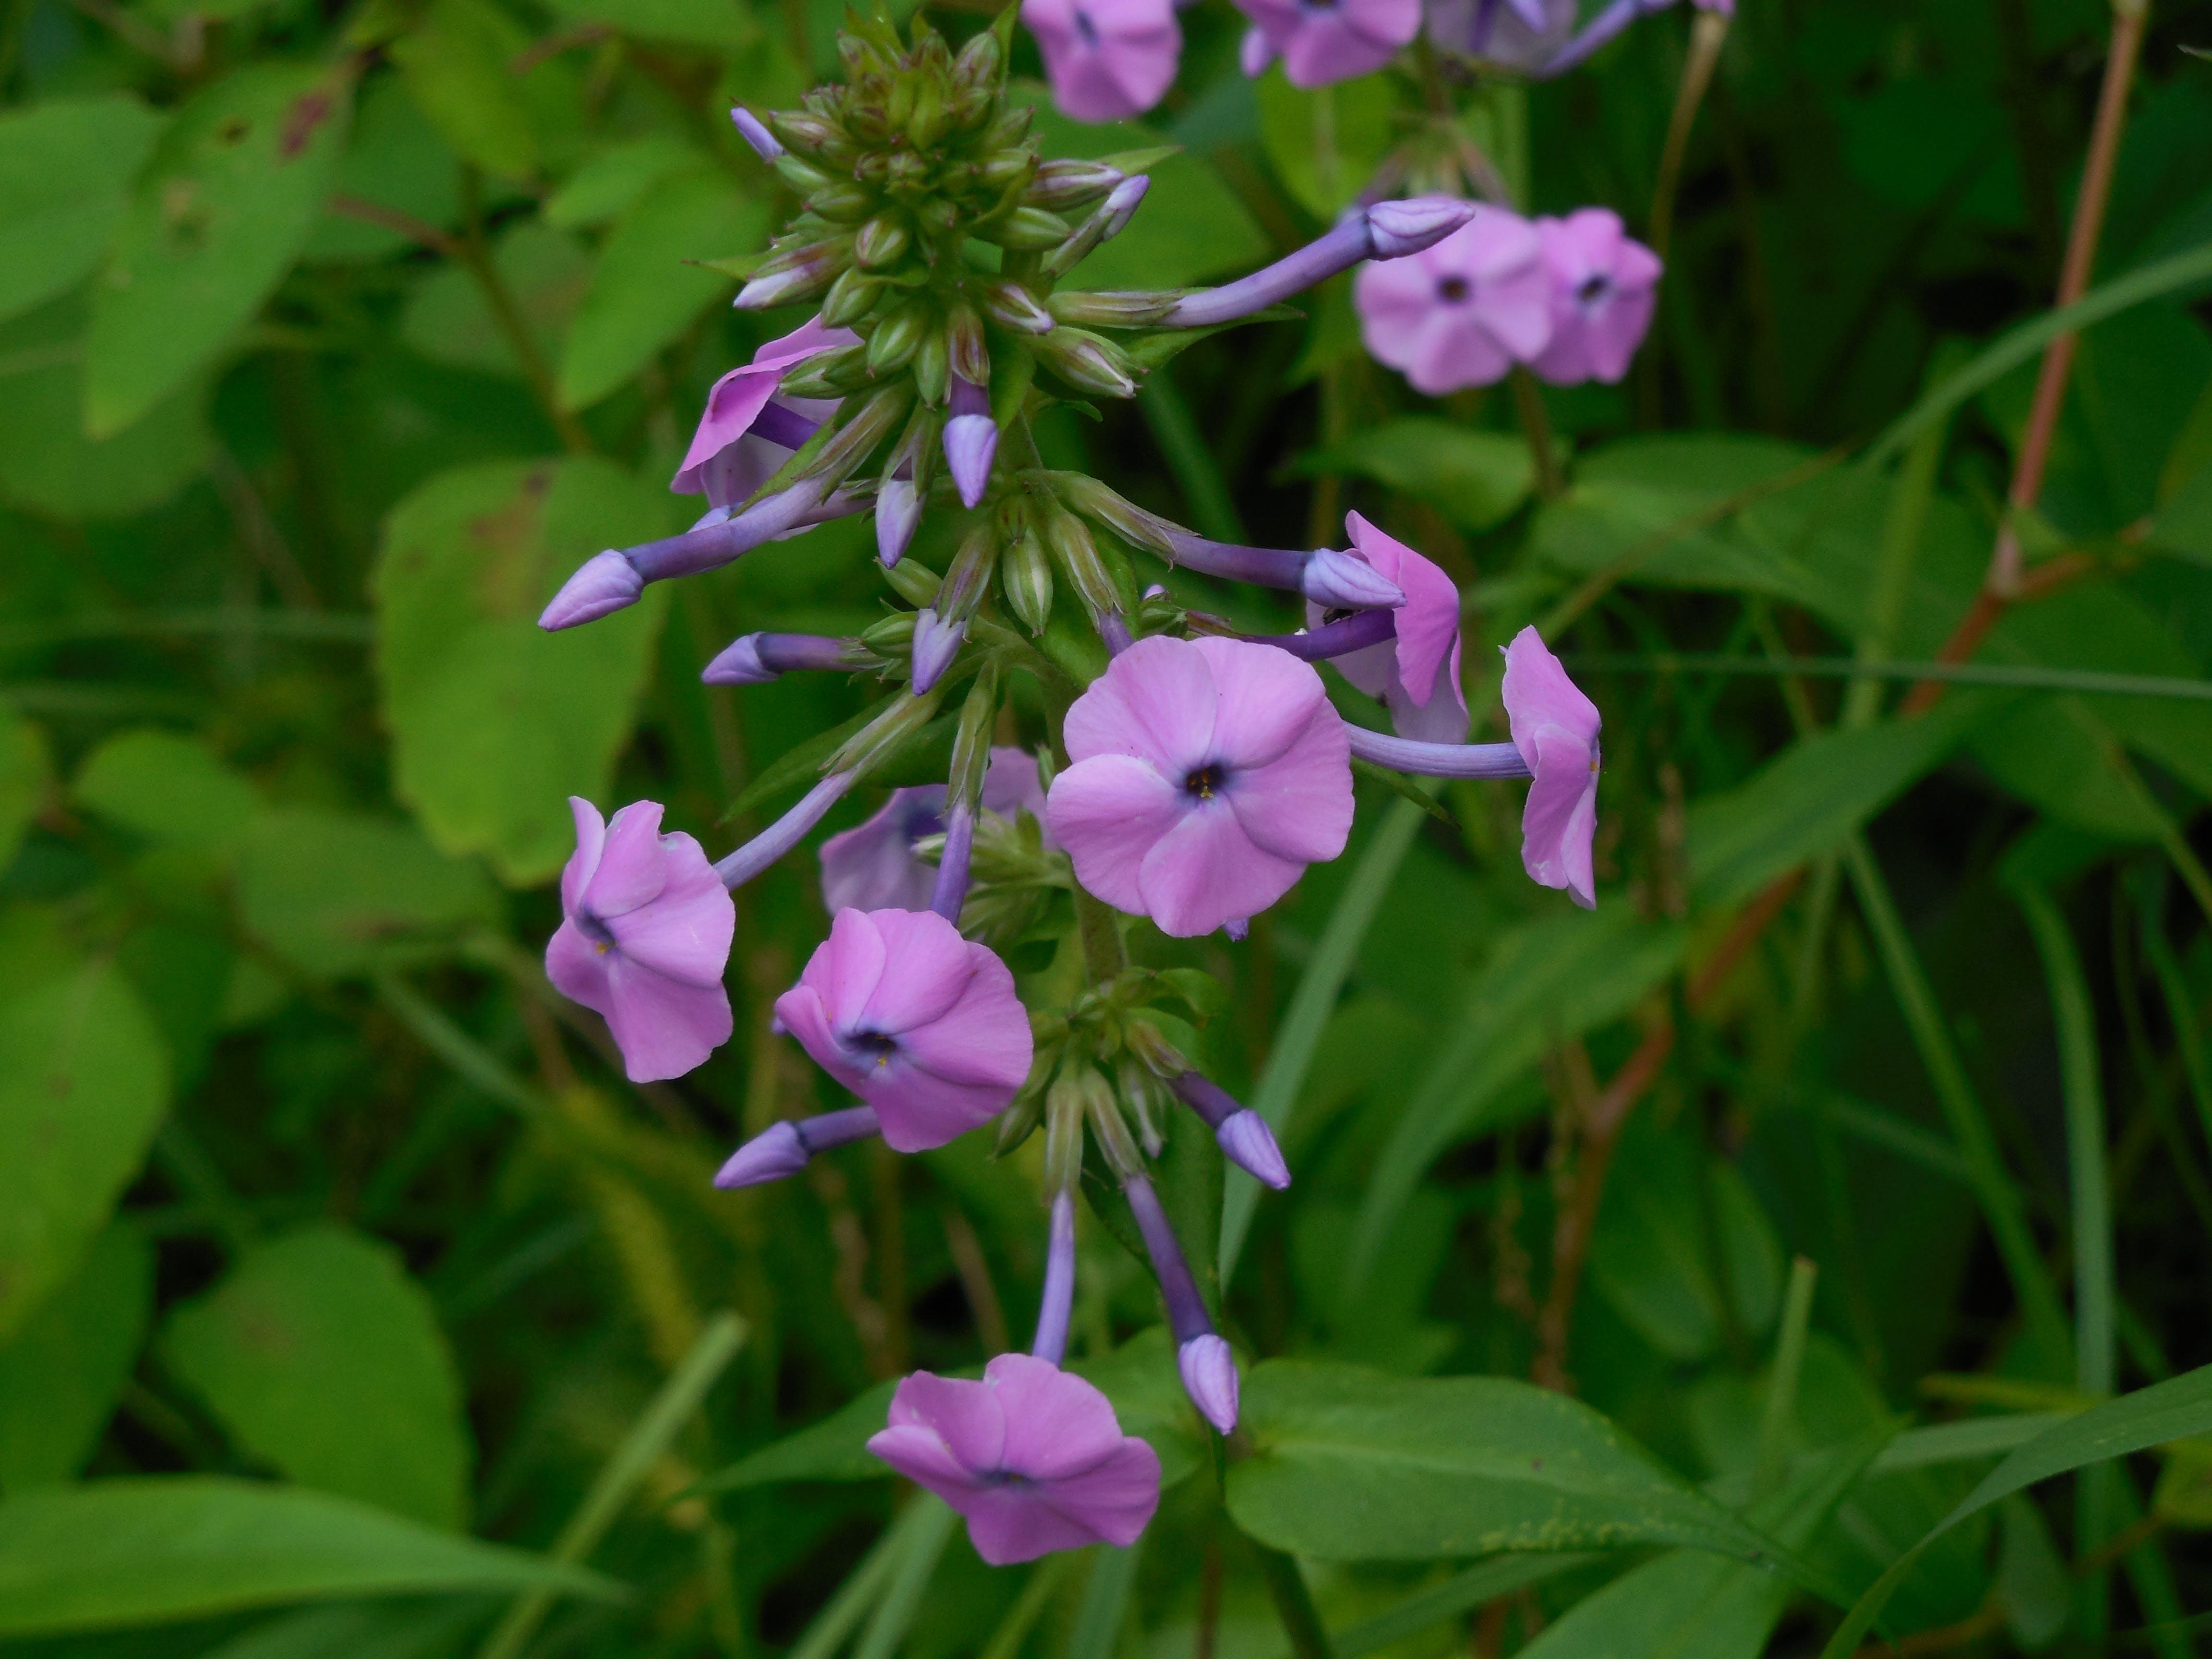 Free stock photo of flower, green, nature, purple